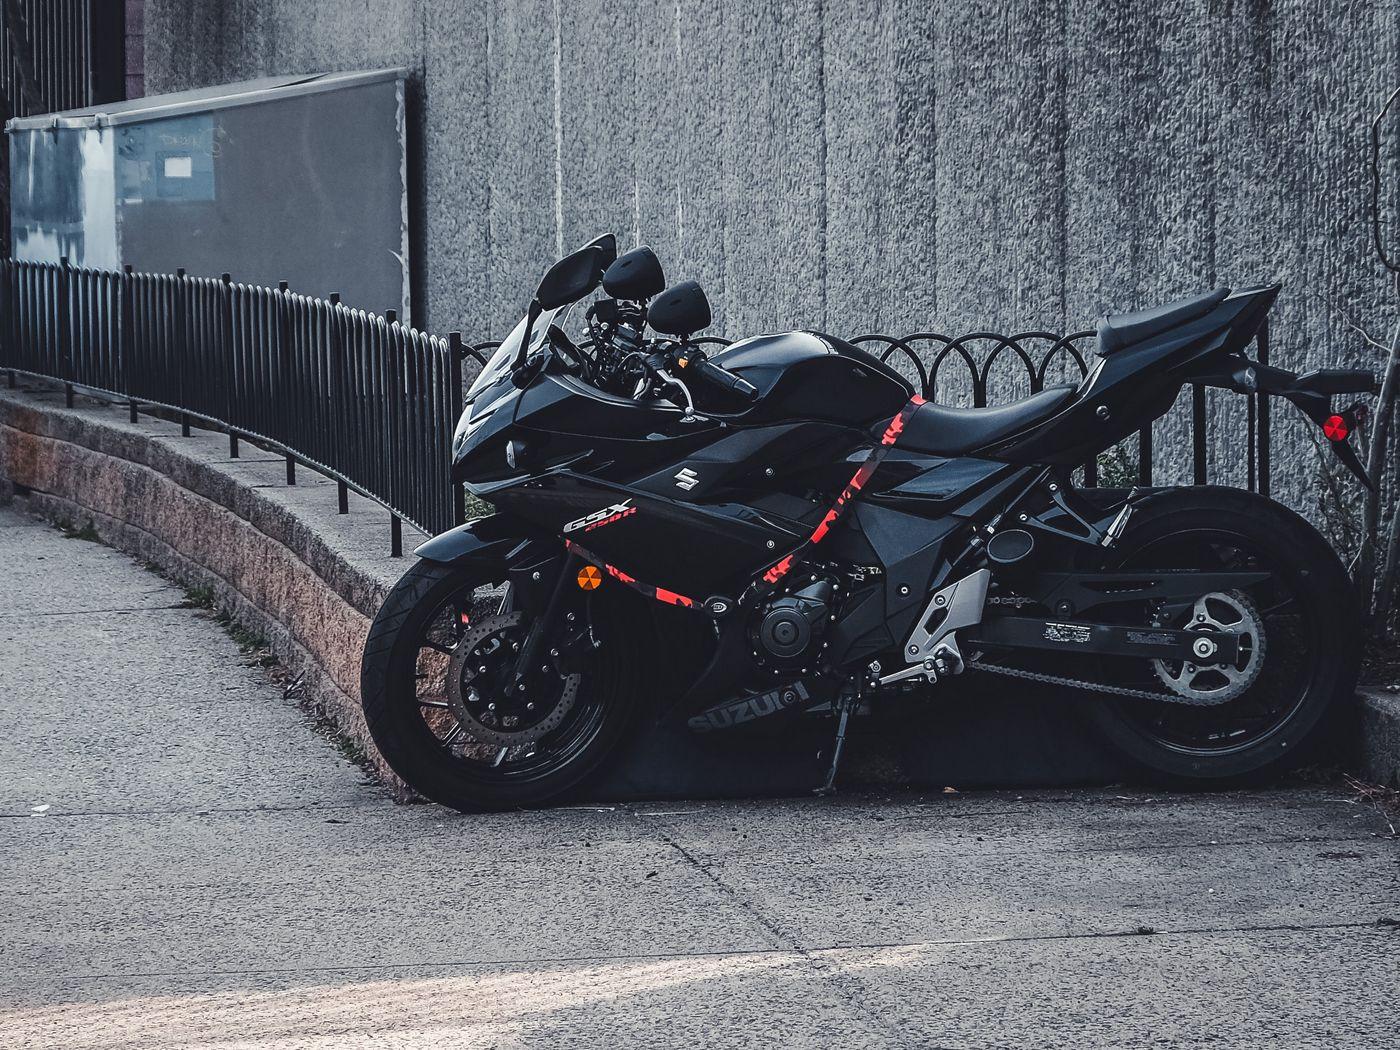 1400x1050 Wallpaper suzuki, motorcycle, bike, black, parking